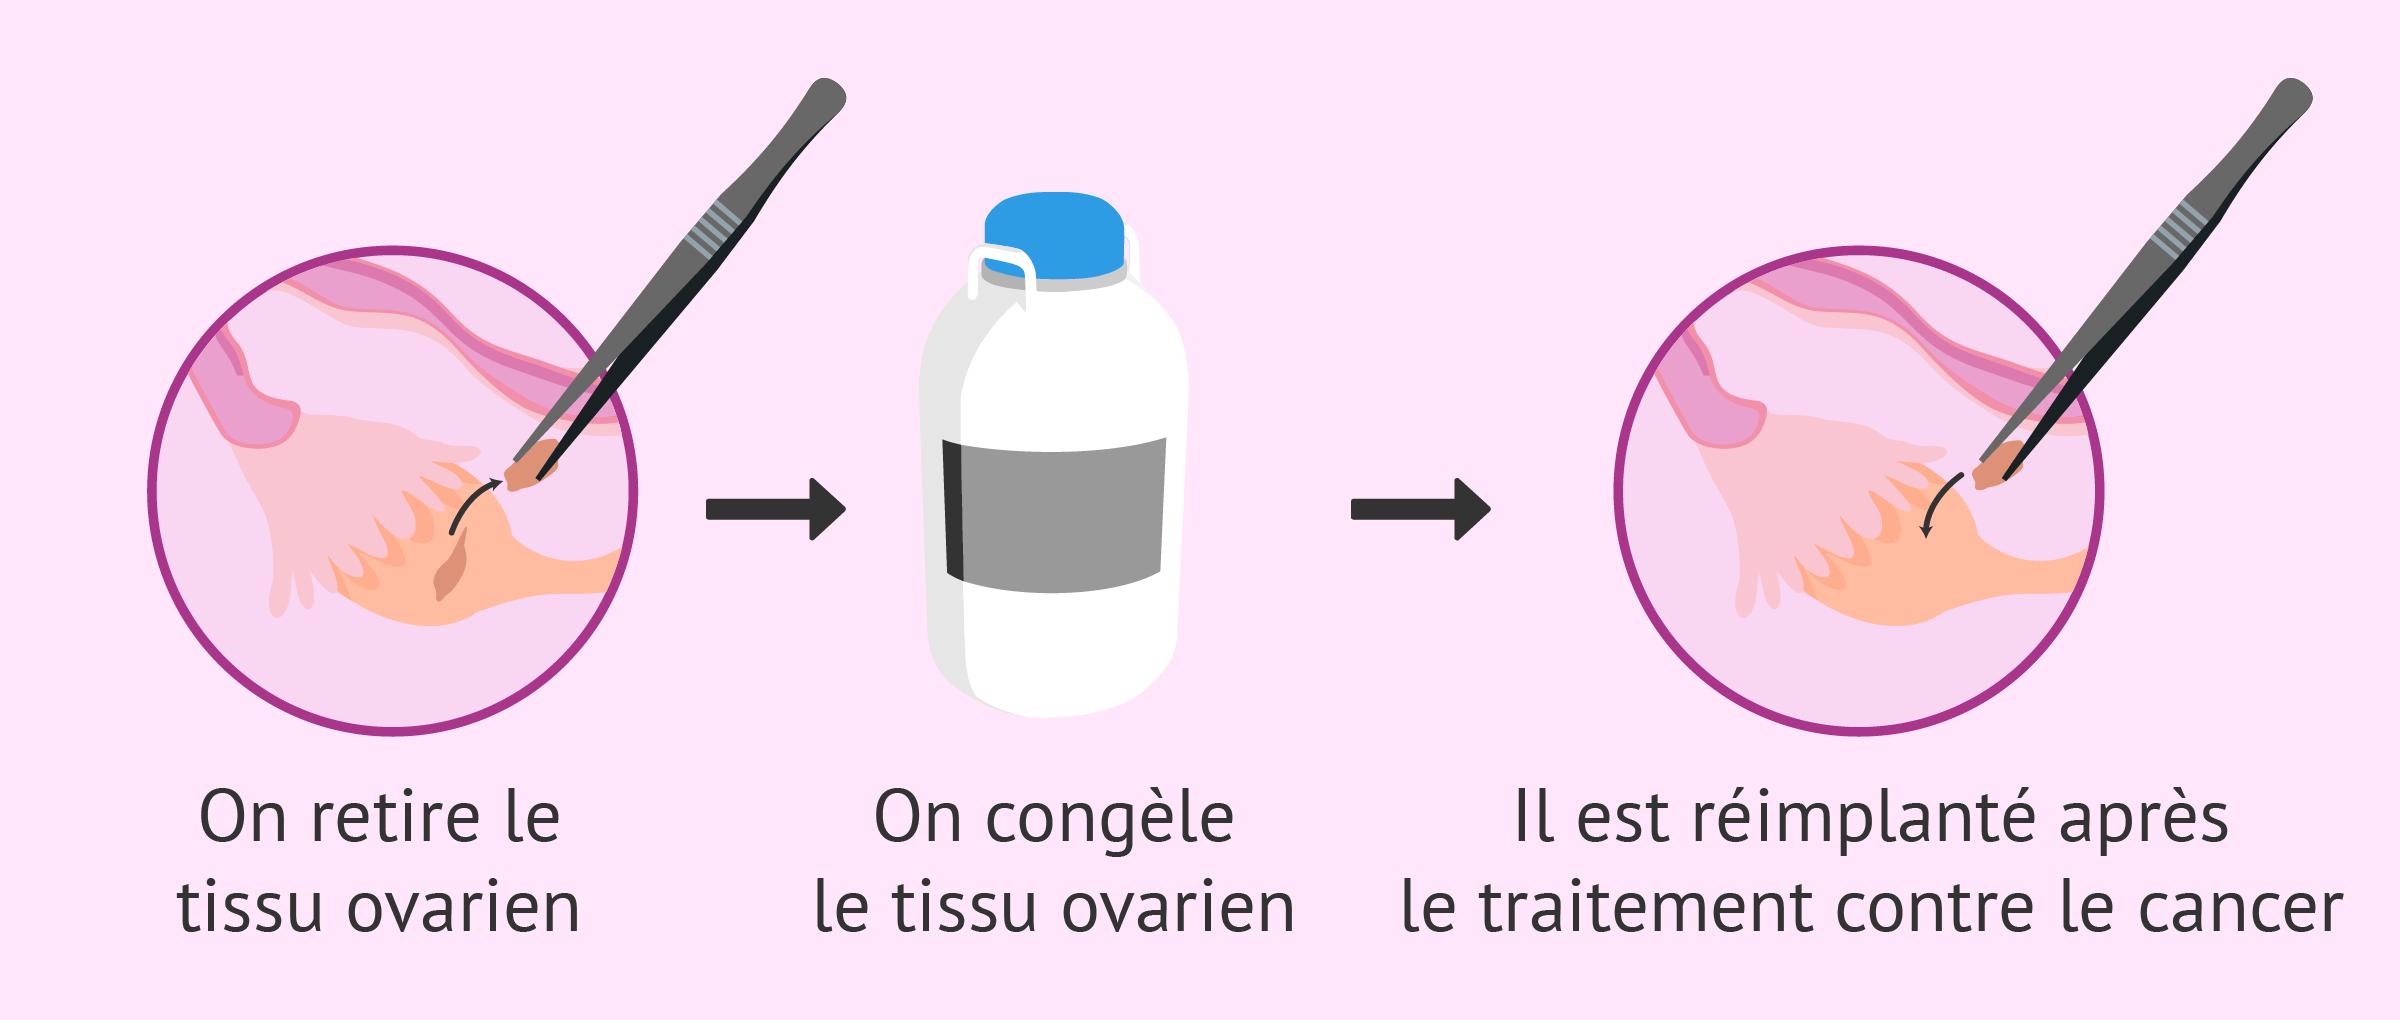 Congélation des tissus ovariens